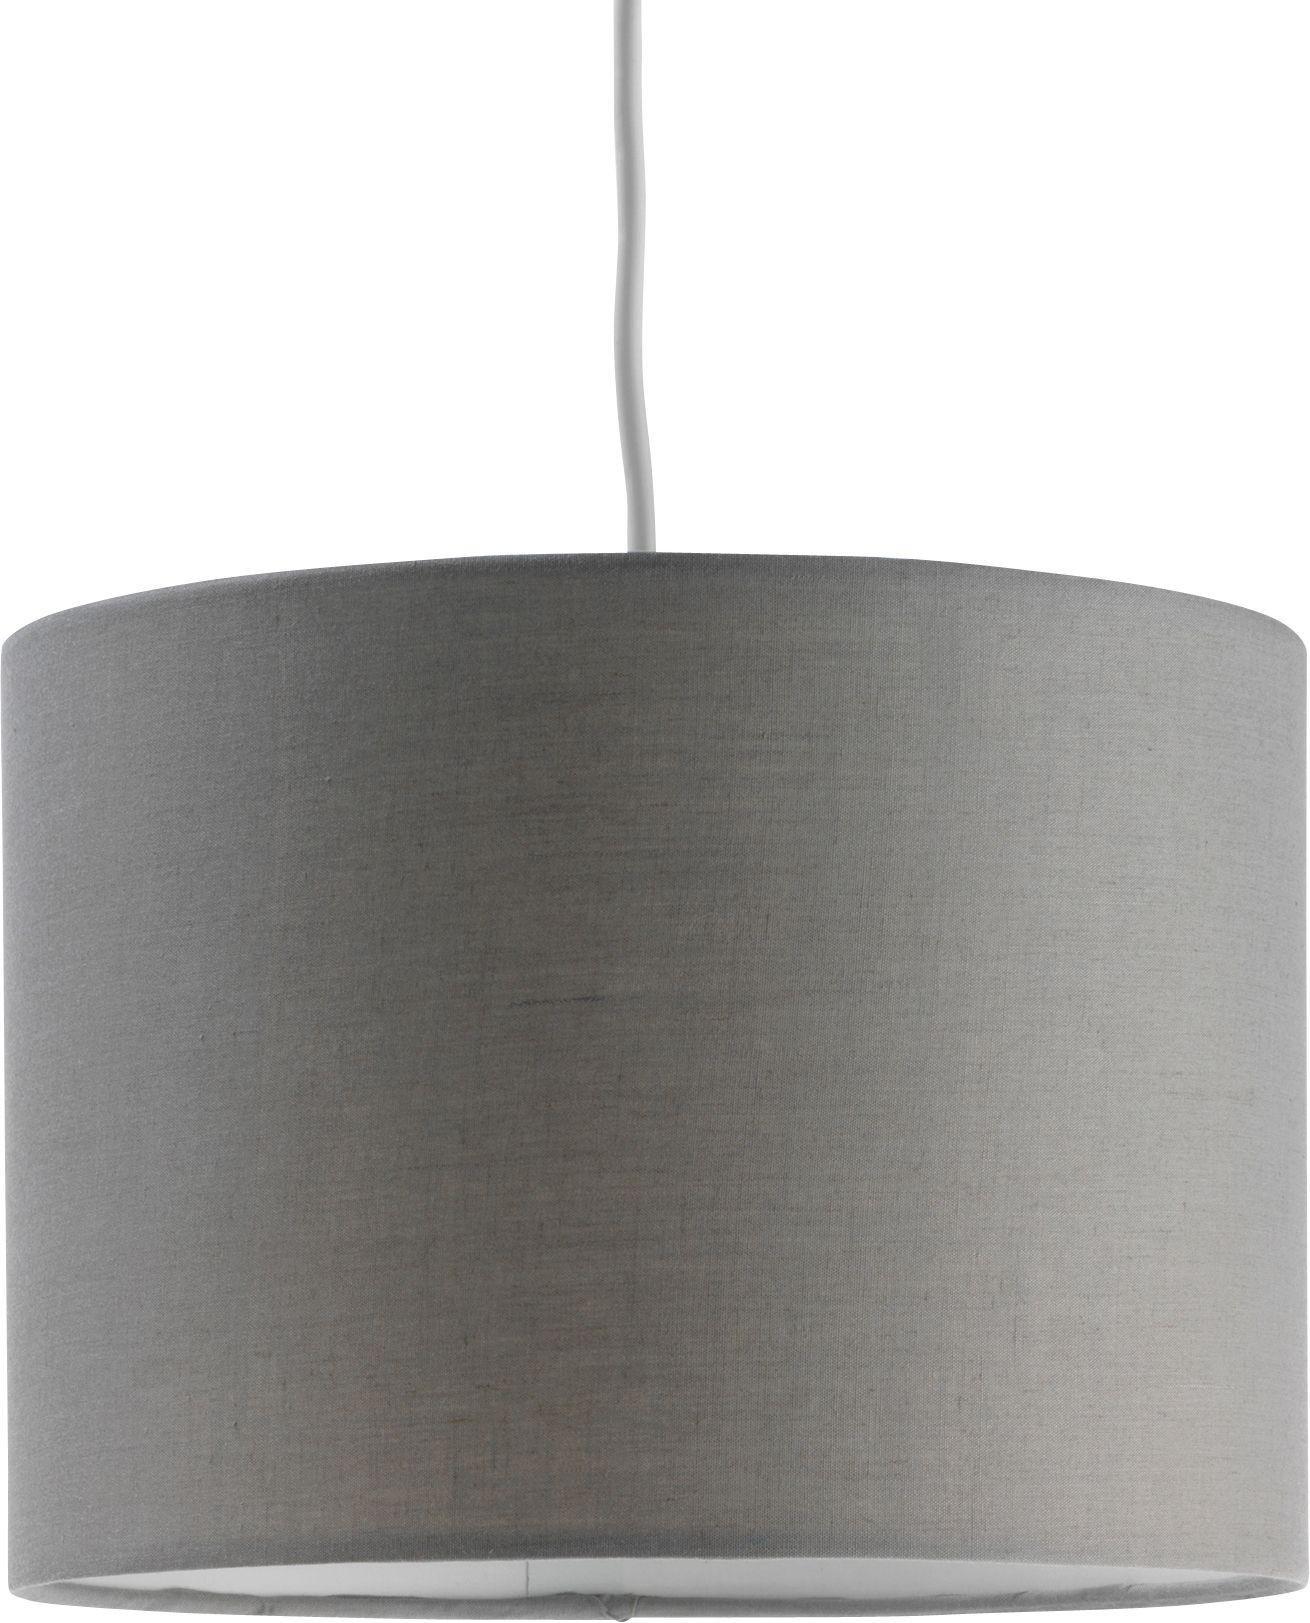 colourmatch fabric light shade - flint grey OQPAWDZ